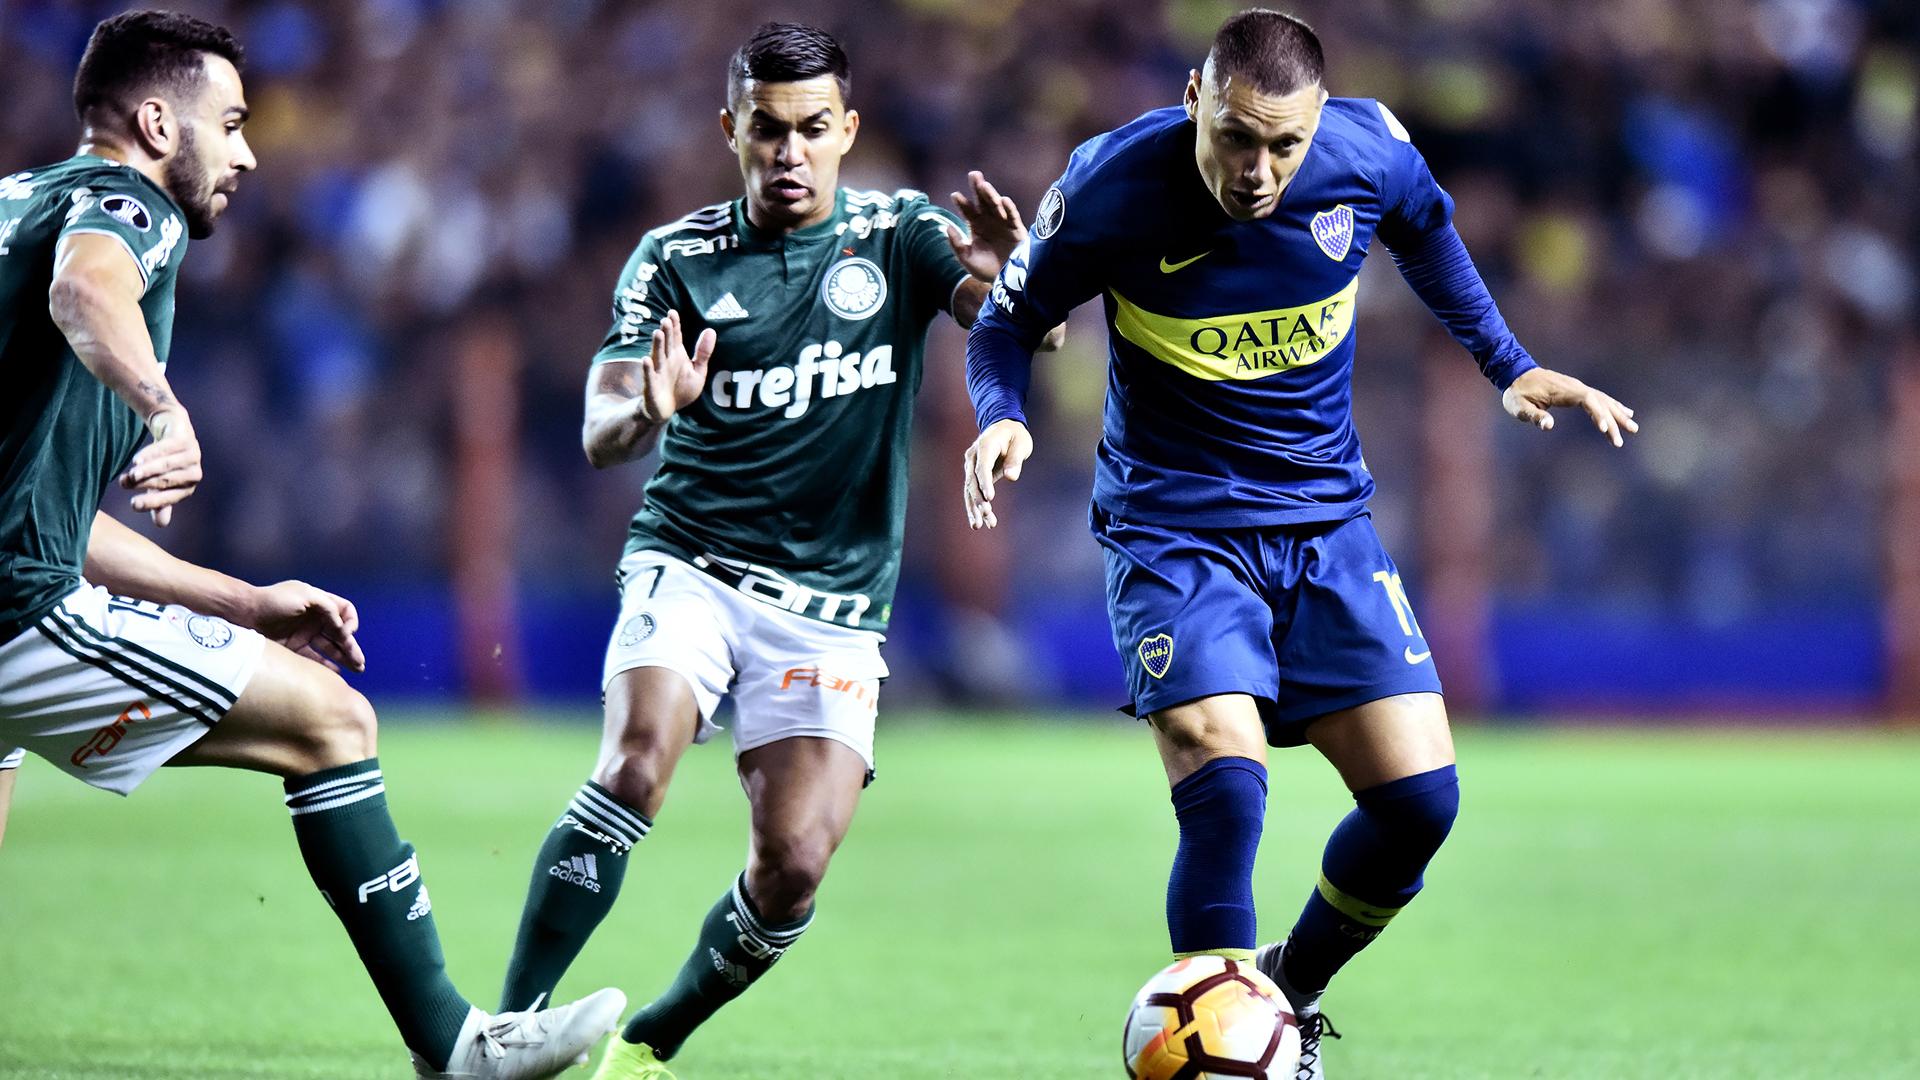 Boca Juniors 2 Palmeiras 0: Benedetto the hero with late brace